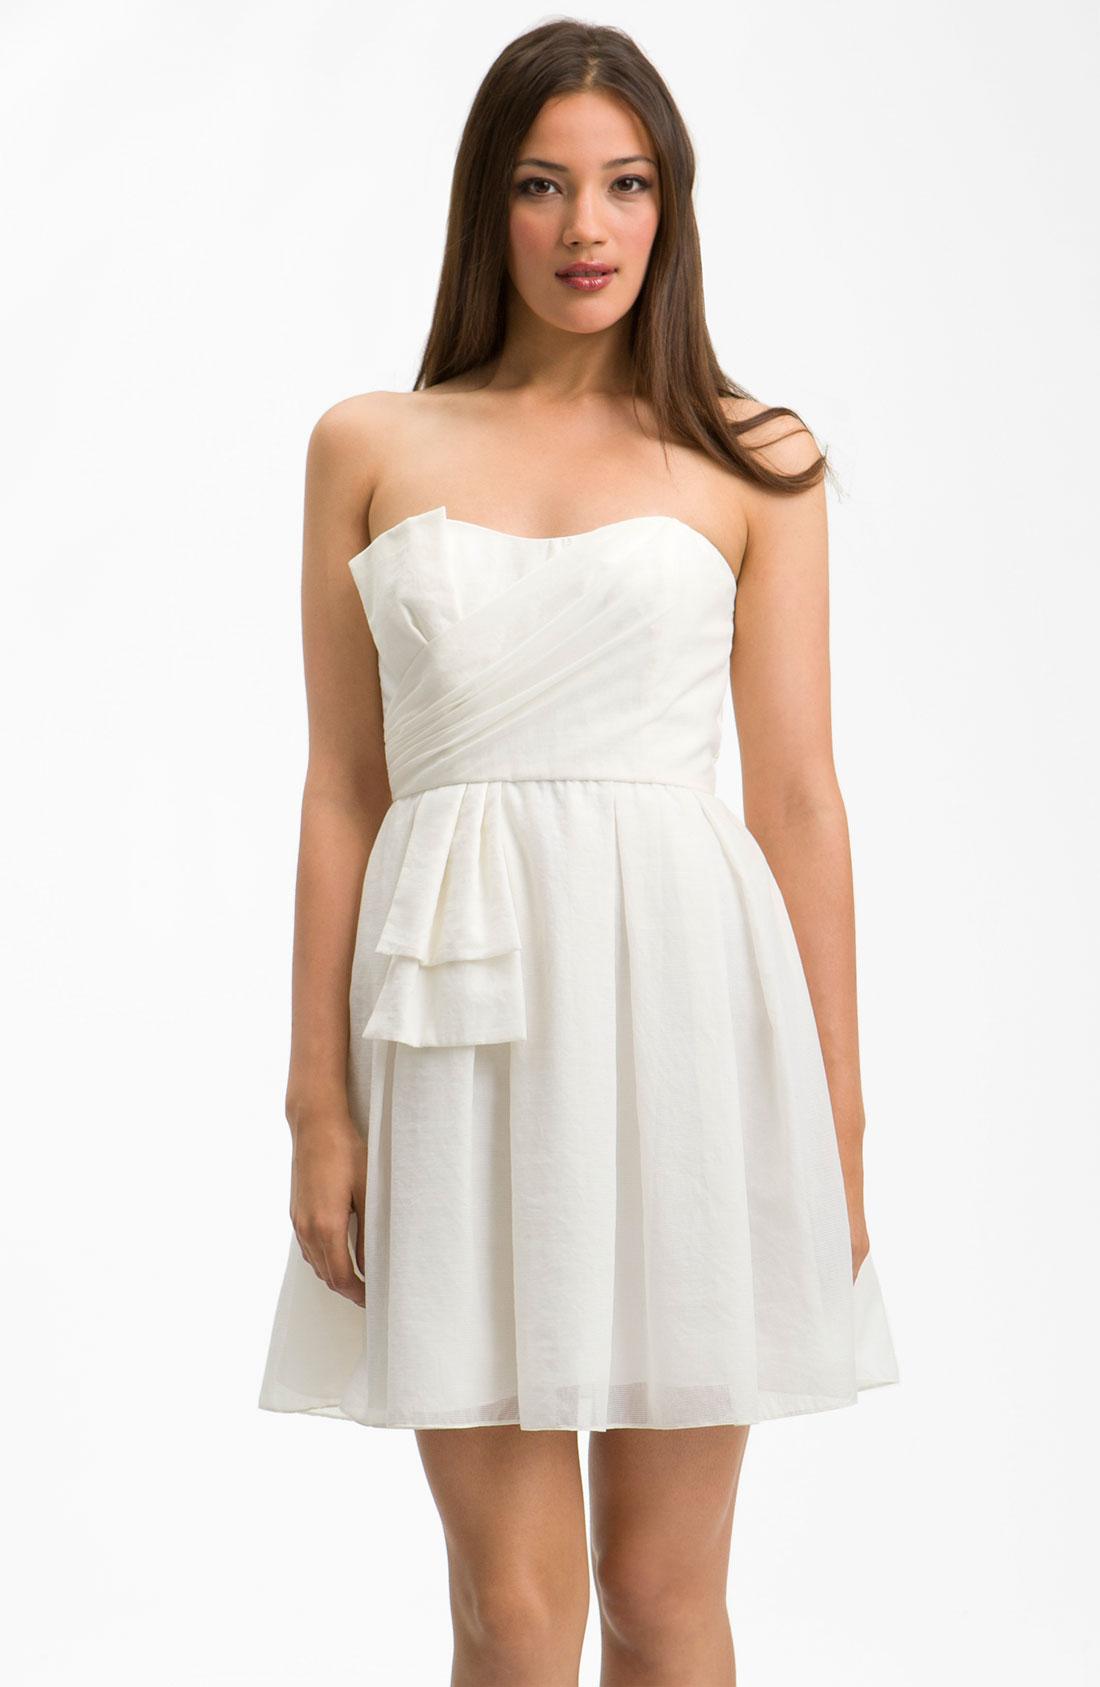 Jill Stuart Sweetheart Neckline Bow Detail Dress In White